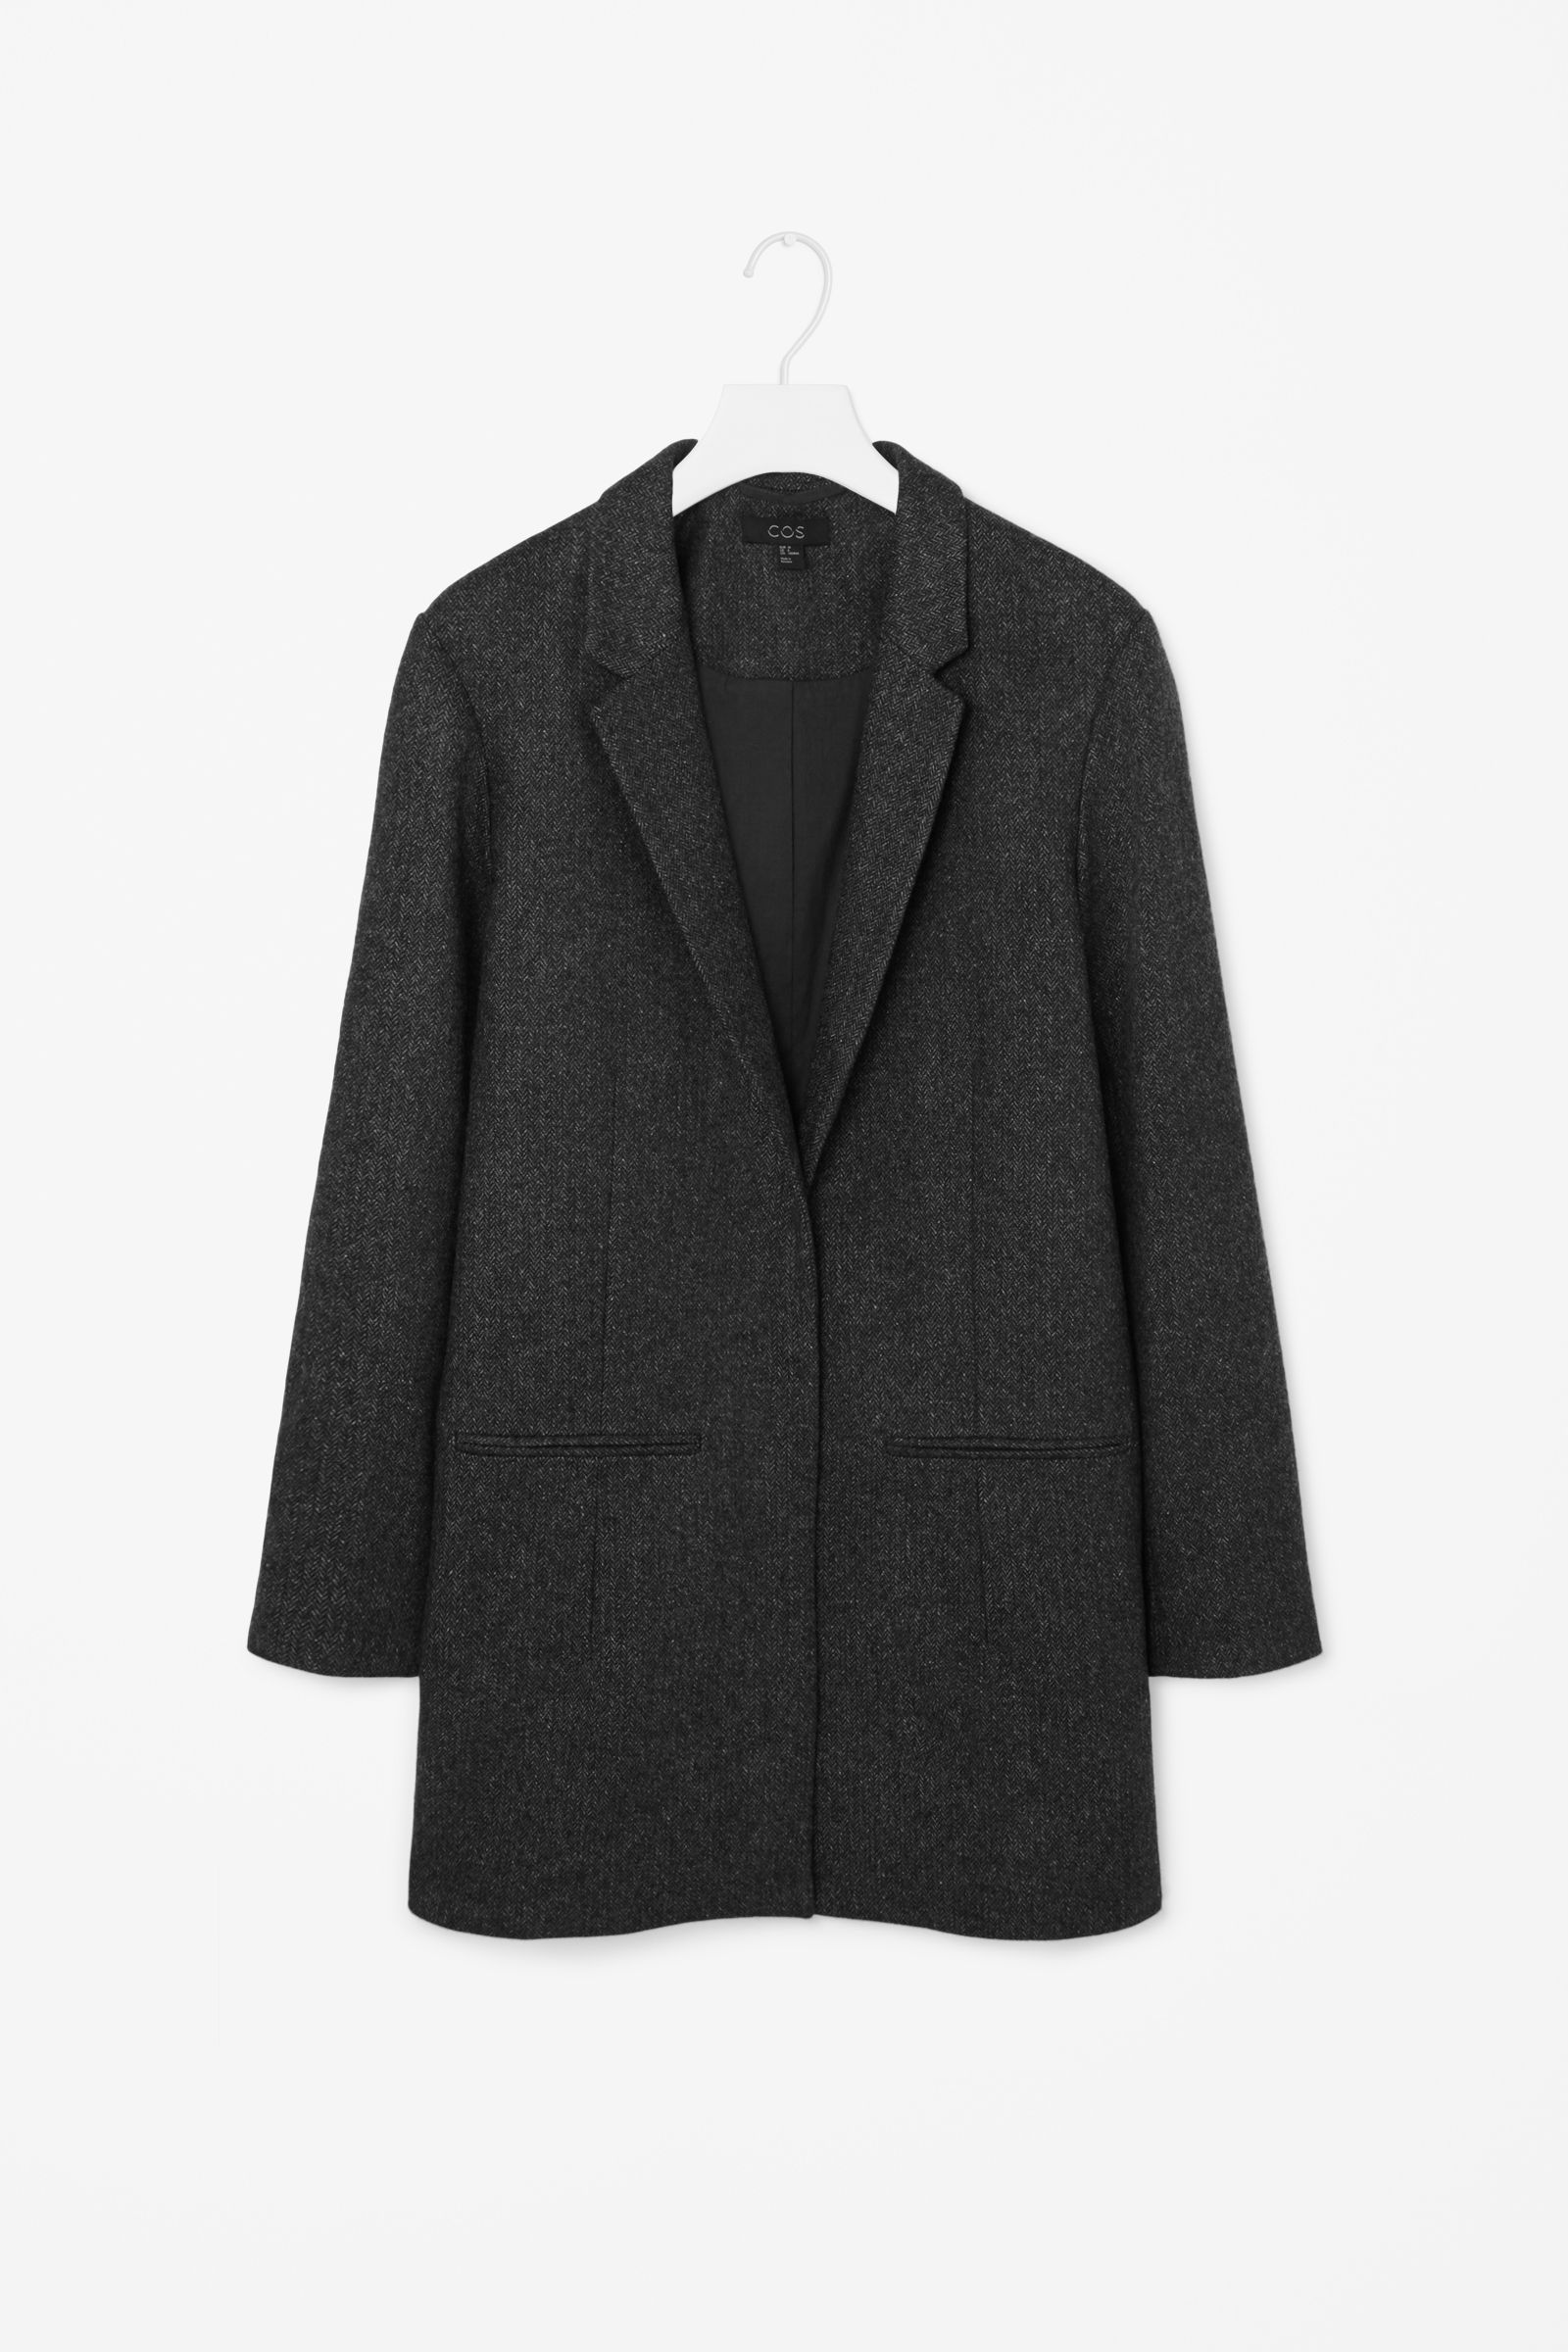 http://www.cosstores.com/gb/Shop/Women/Coats_Jackets/Long_wool_blazer/46891-20992765.1